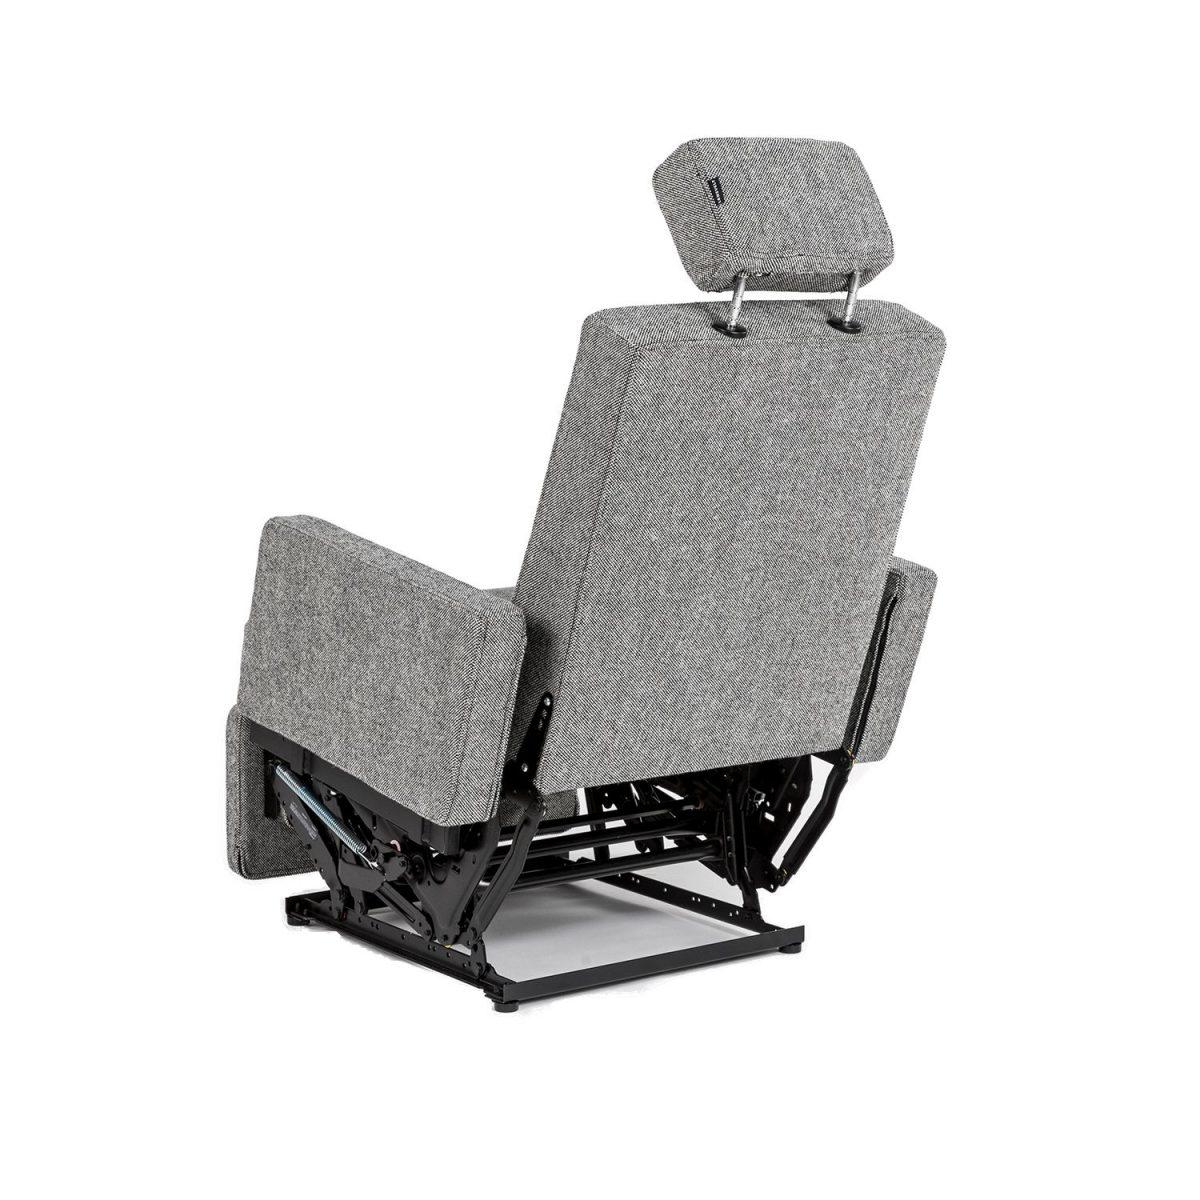 Lensvelt Atelier Van Lieshout Lazy Modernist Loungestoel Fauteuil Comfort Werkplek